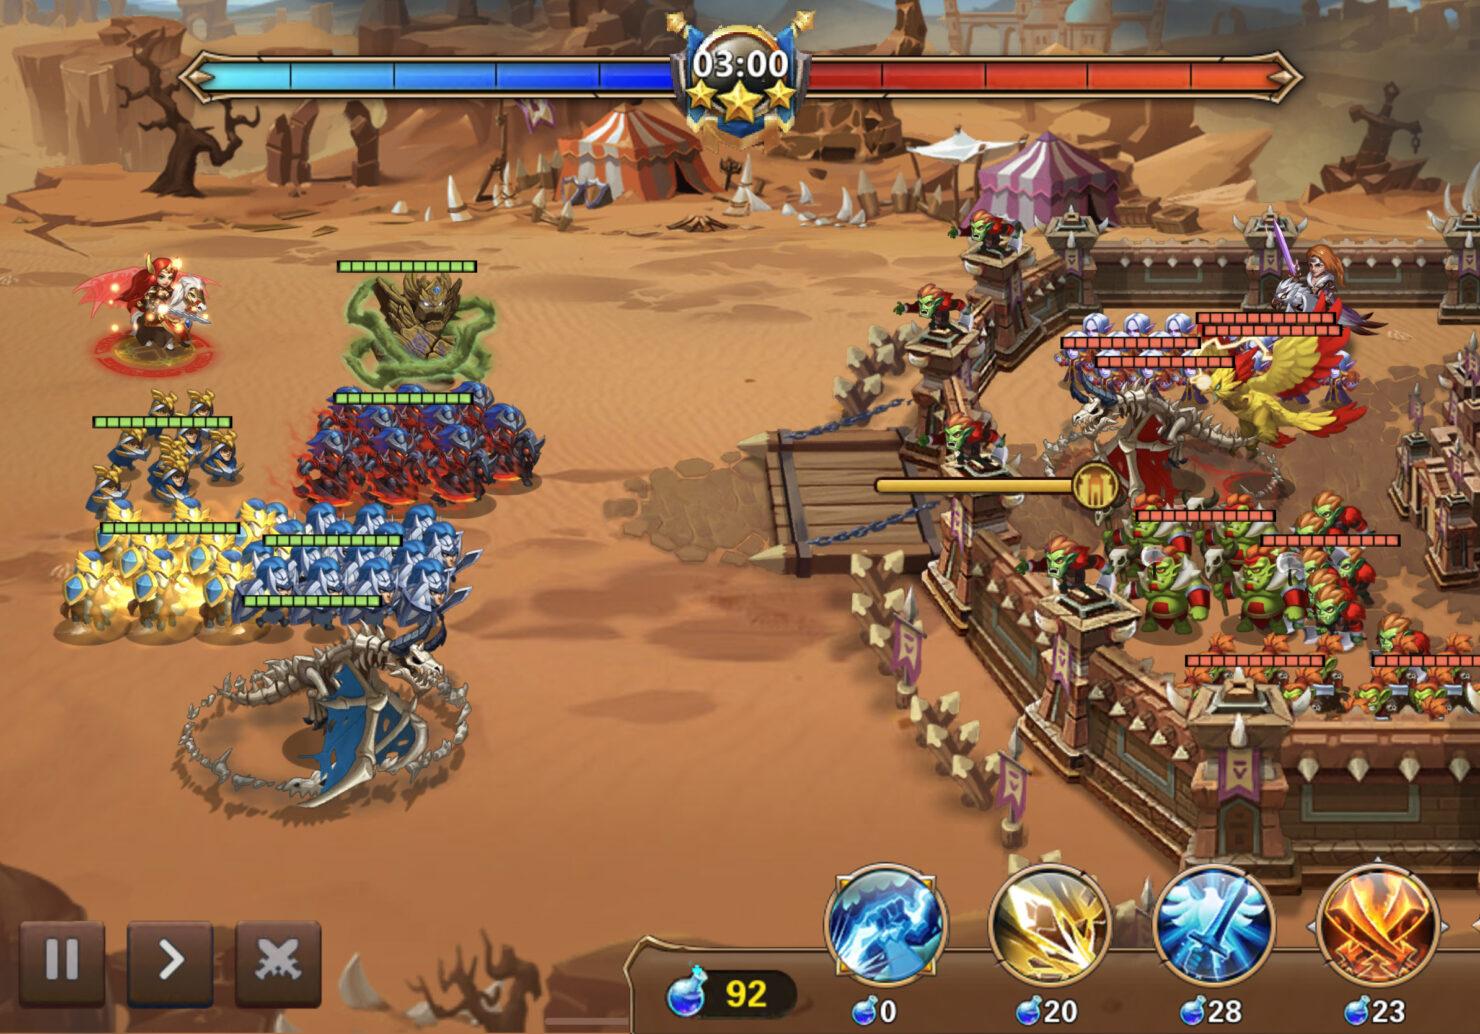 mmheoc_castle-gameplay_2388x1668_en